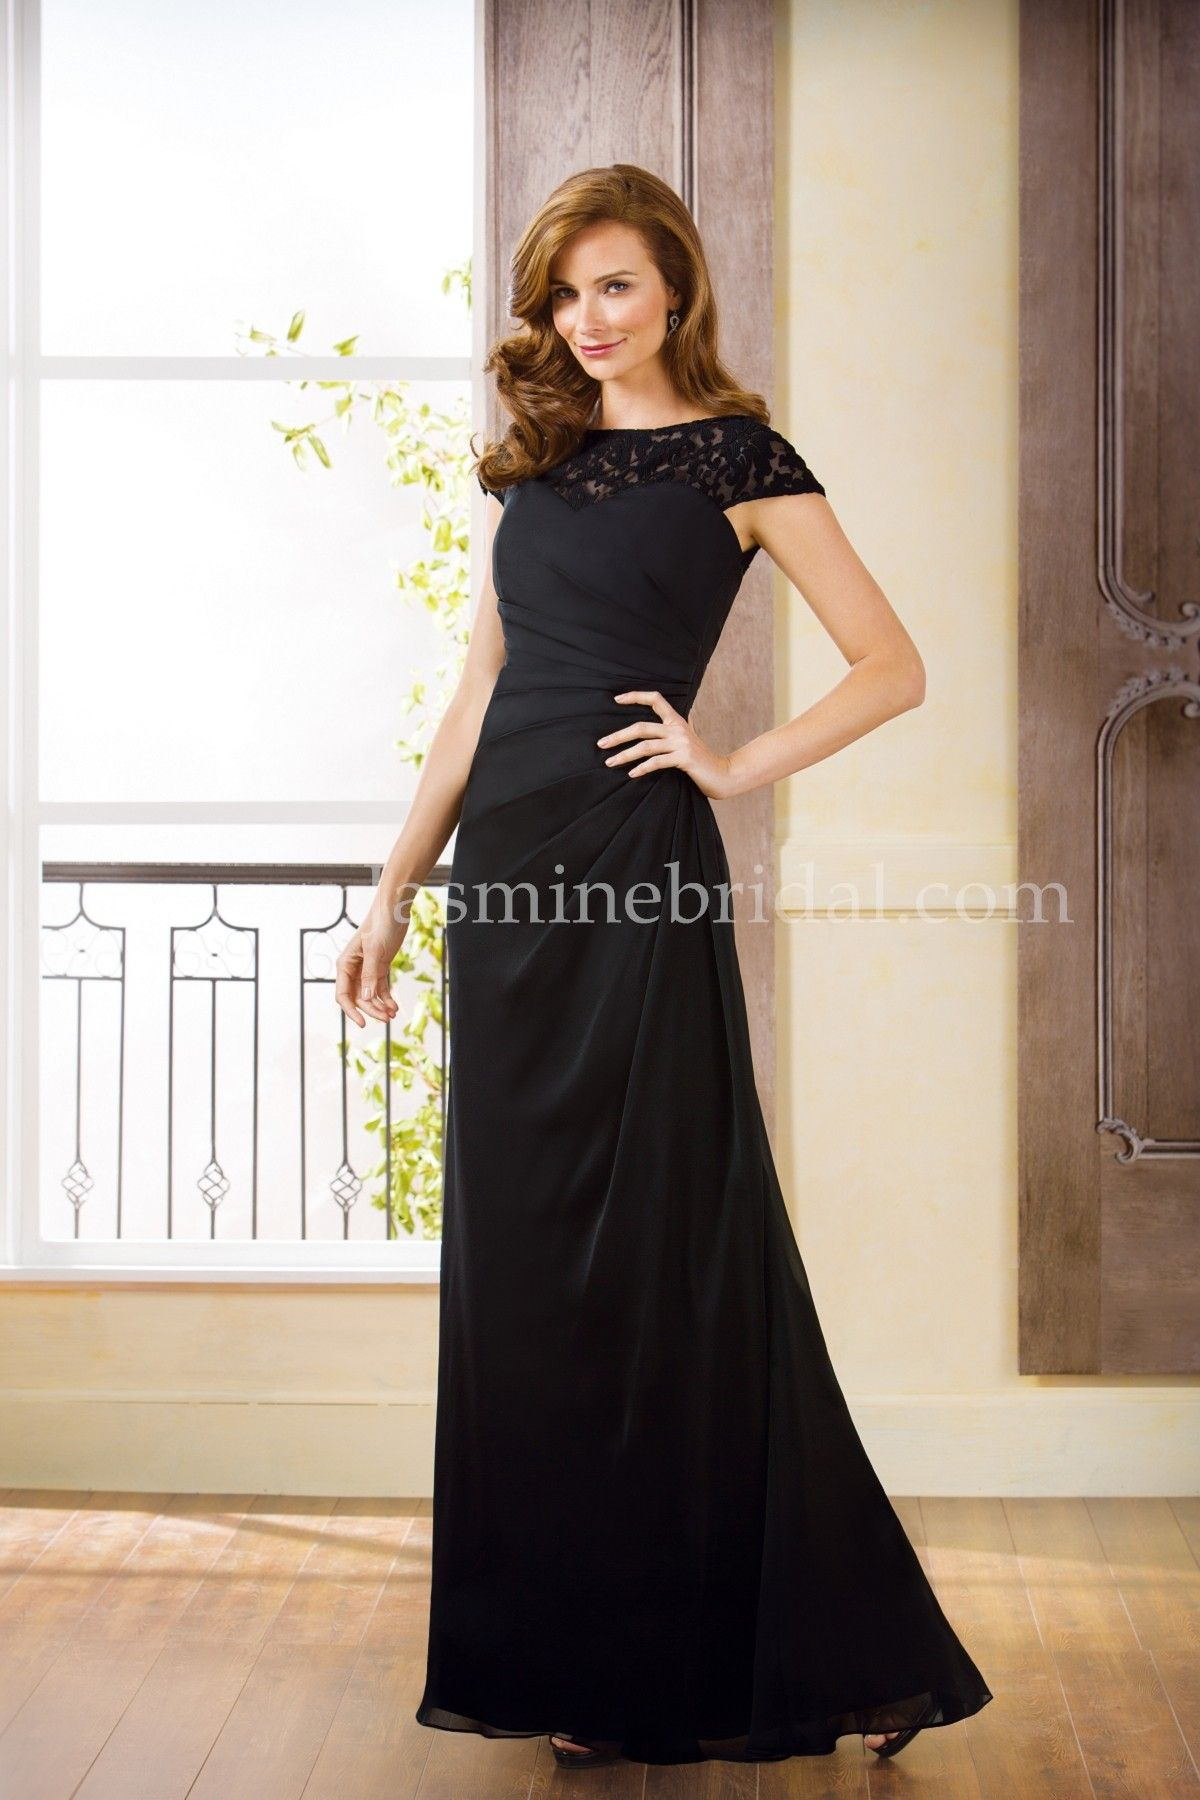 Evening dresses in baton rouge